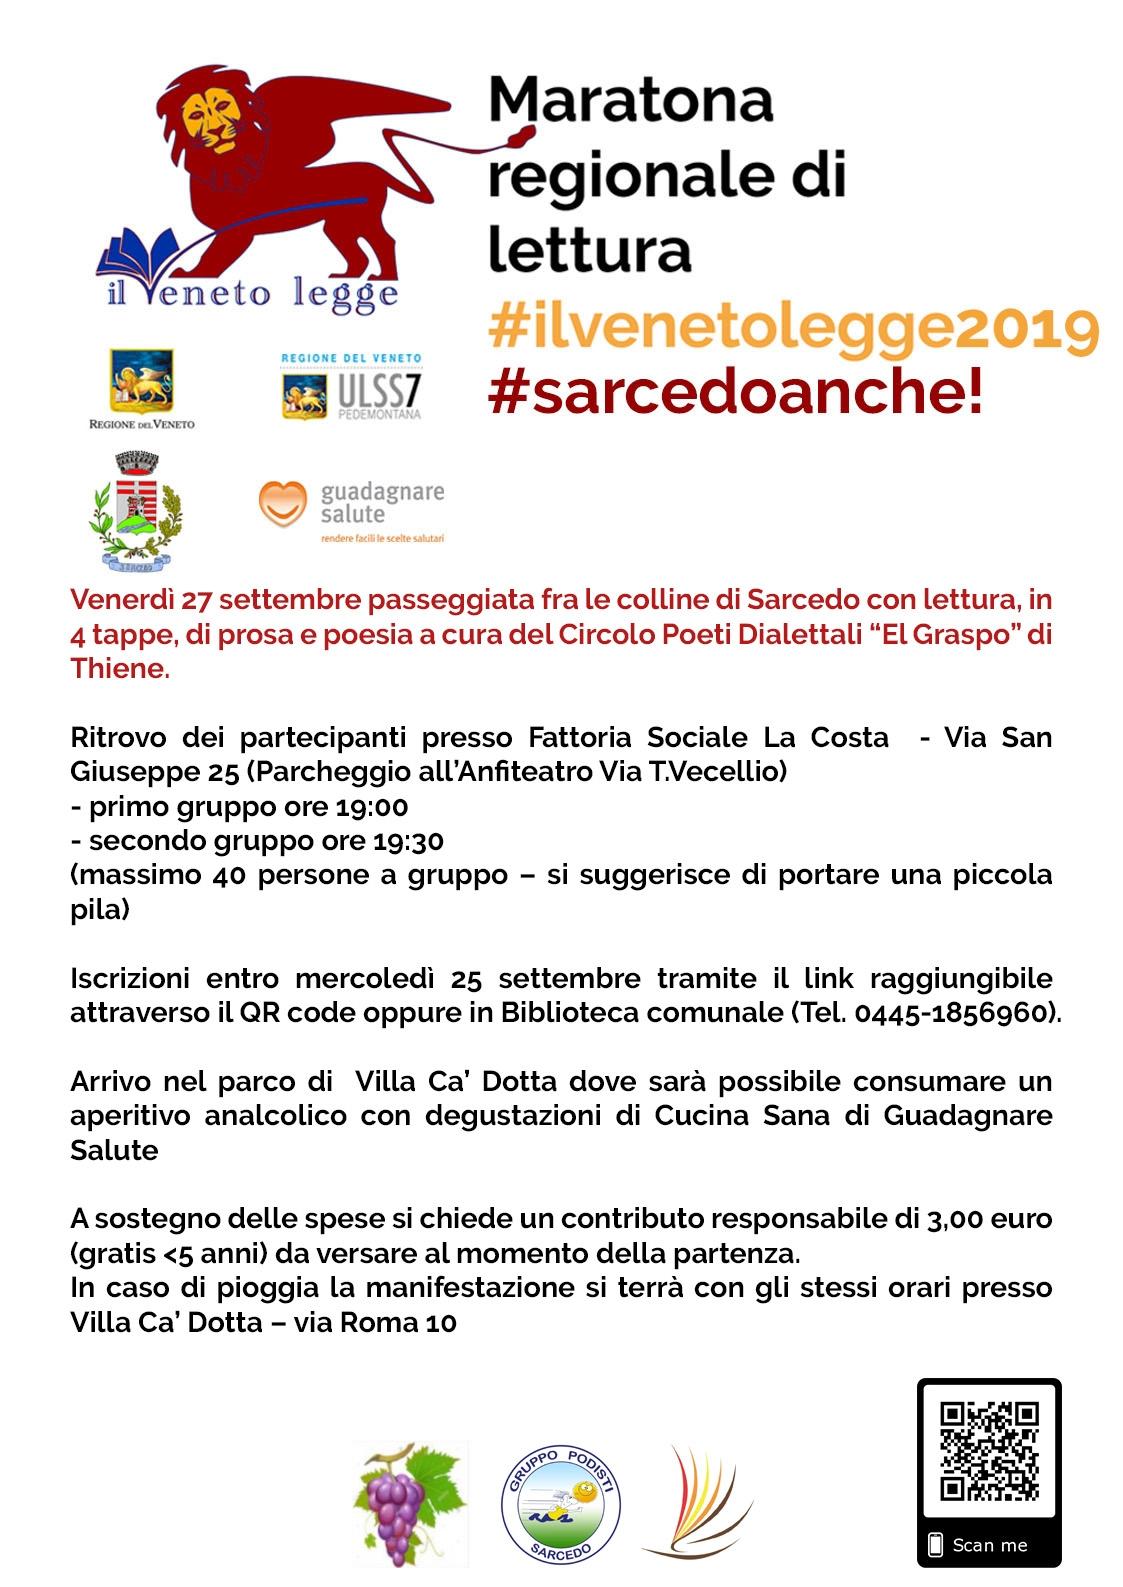 Calendario Marce Veneto.In Evidenza Gruppo Podisti Il Sorriso Sarcedo